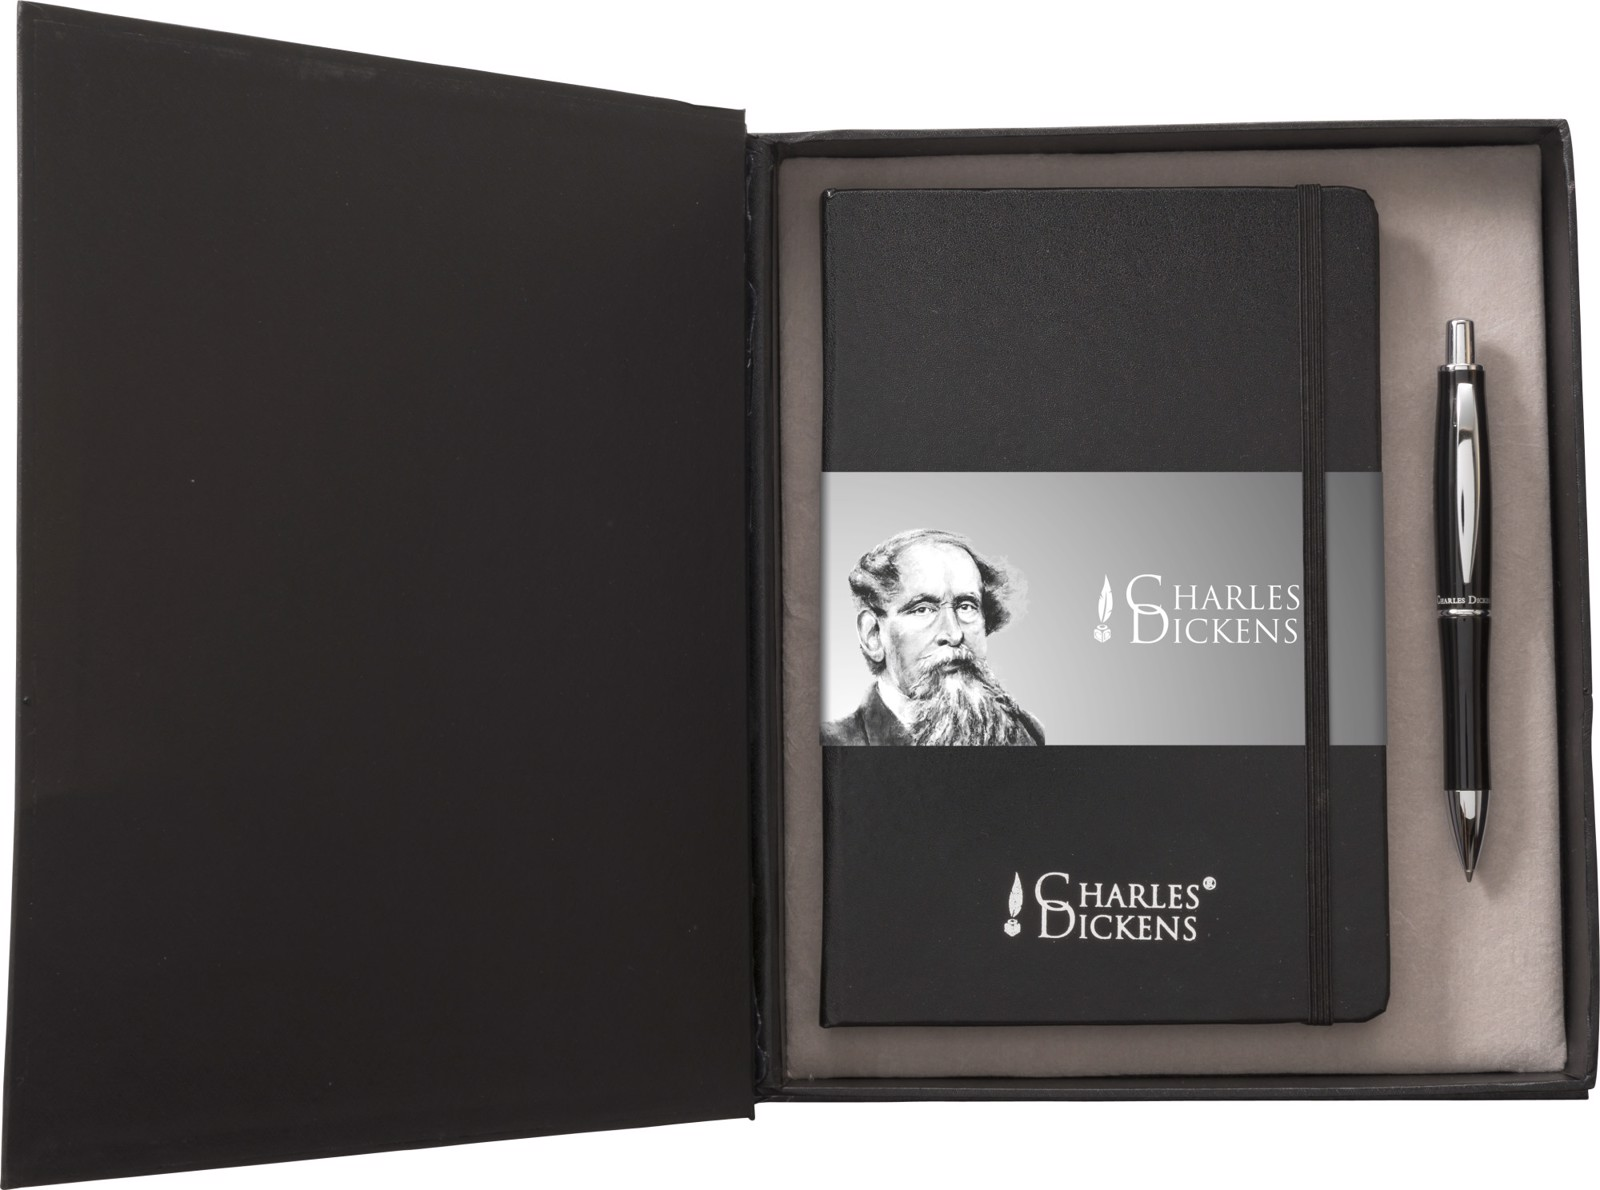 Aluminium Charles Dickens® writing set